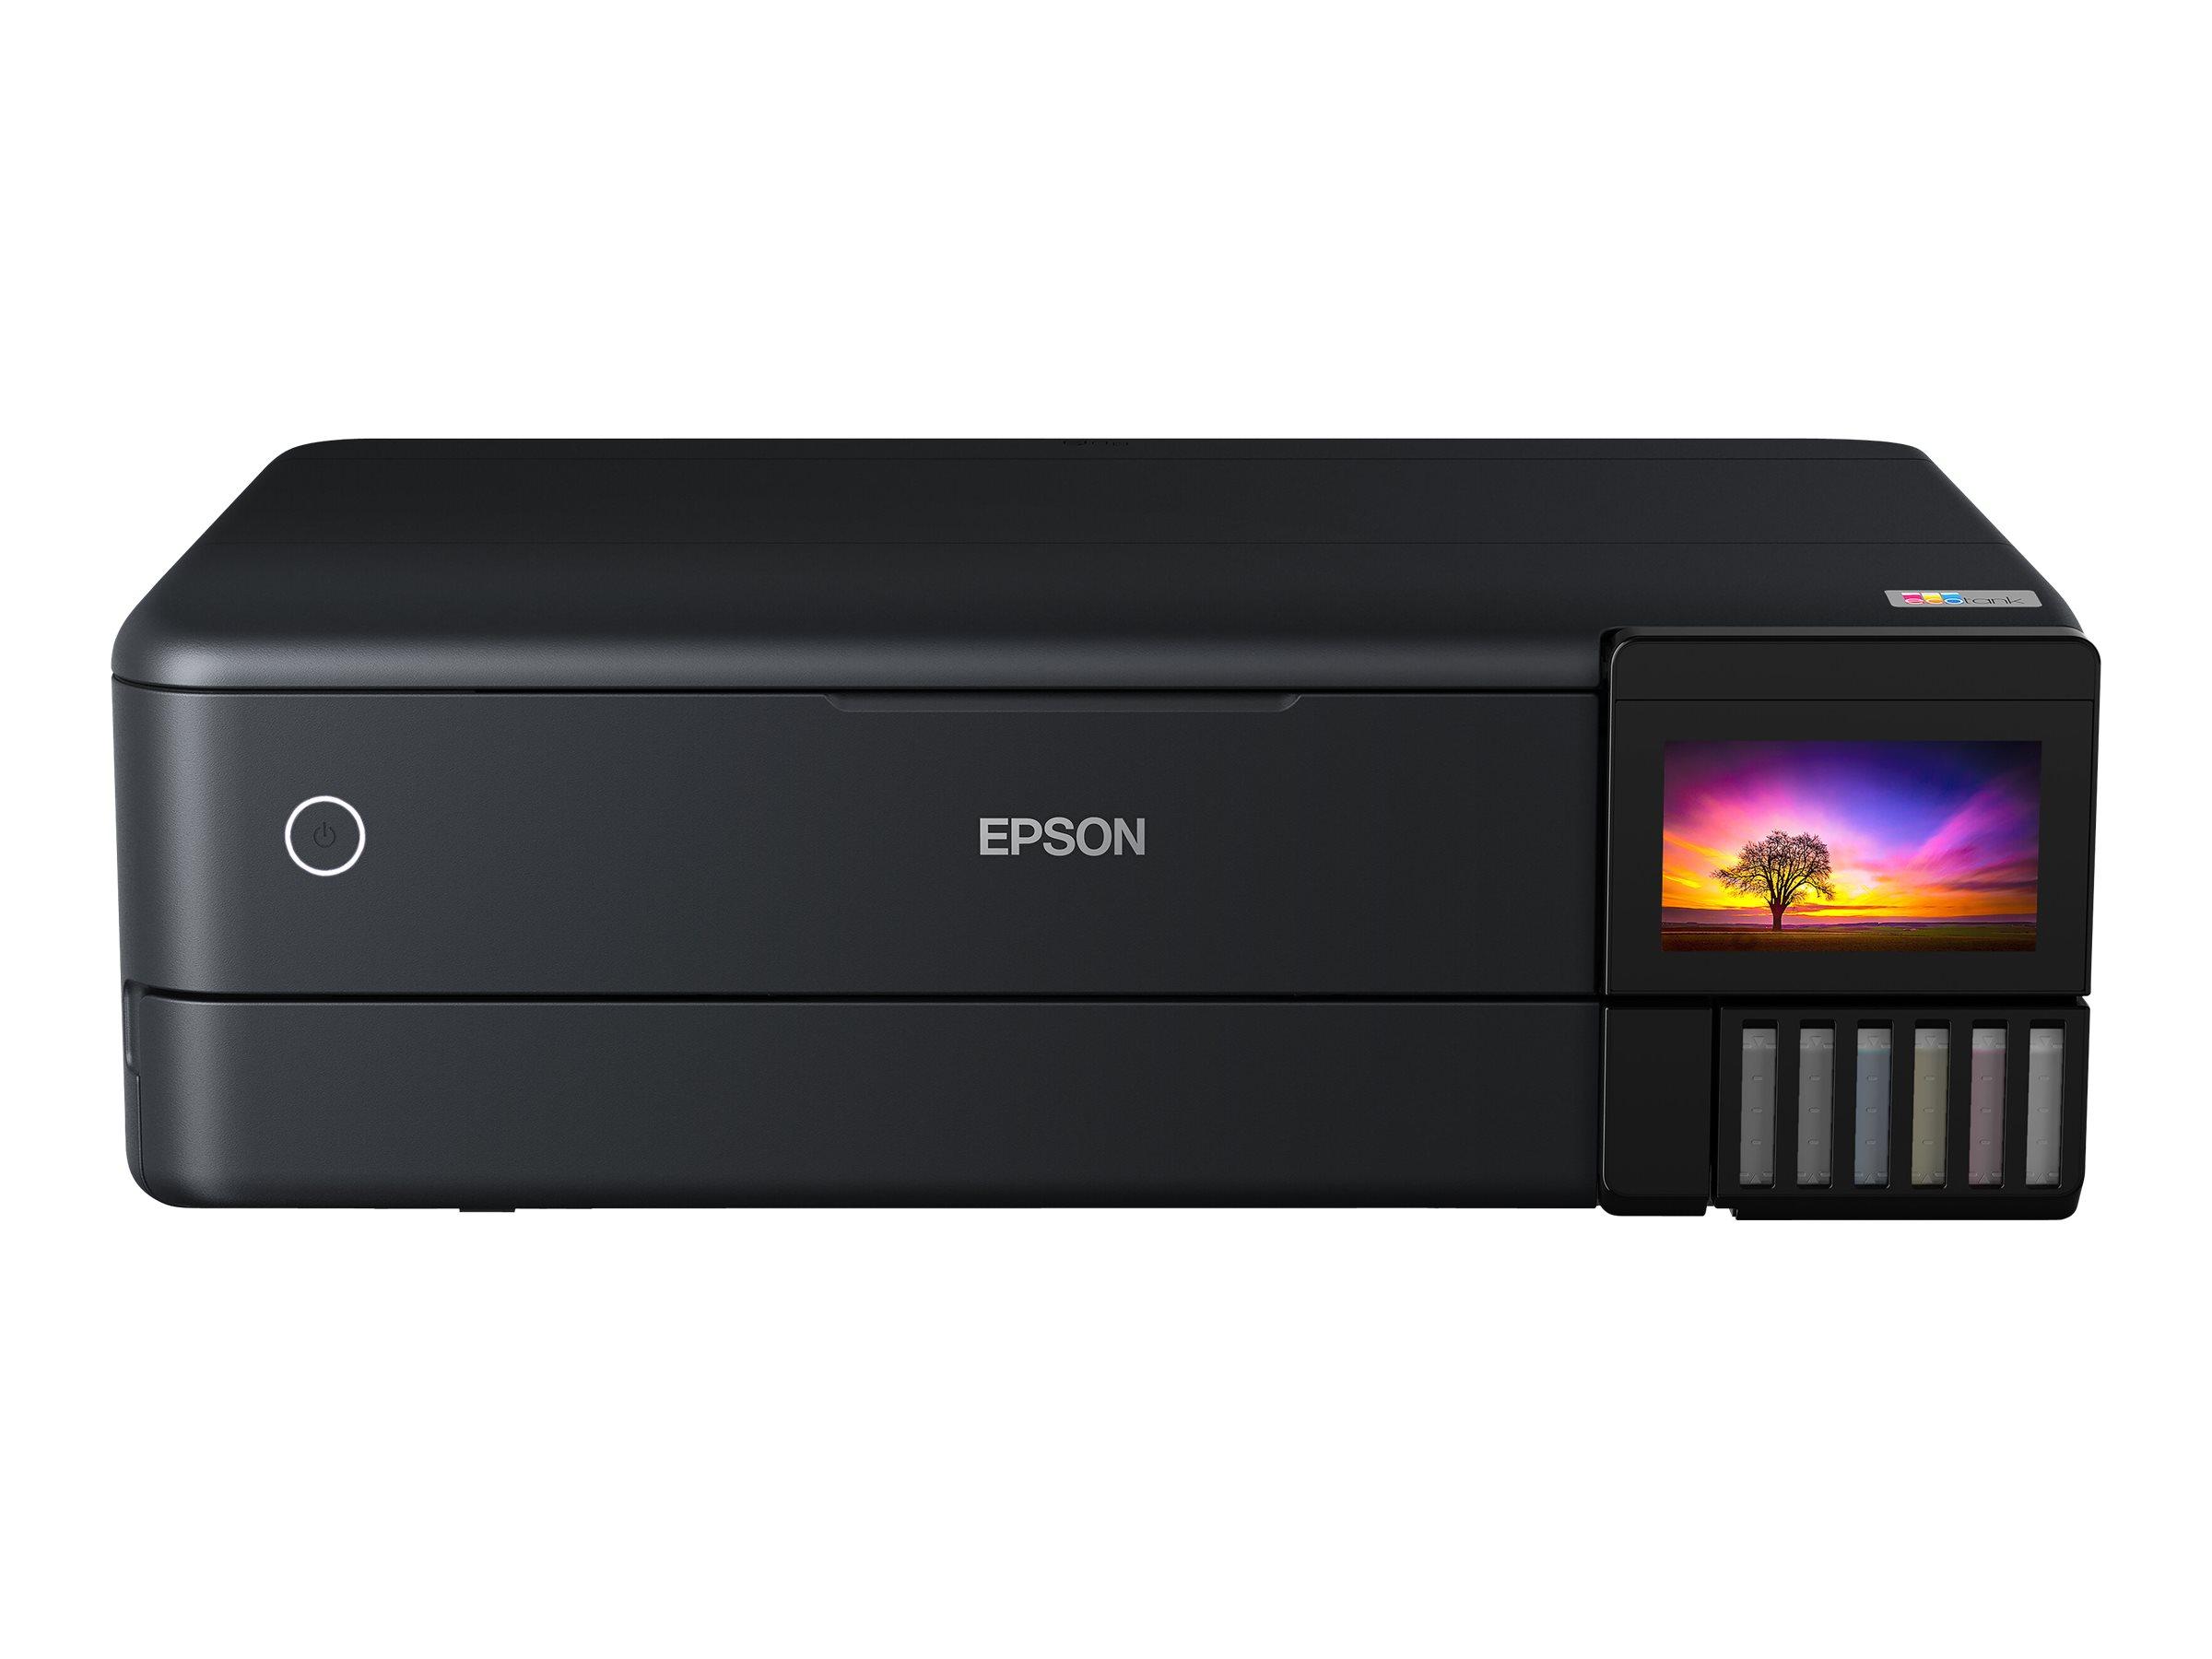 Epson EcoTank ET-8550 - Multifunktionsdrucker - Farbe - Tintenstrahl - refillable - A3 (Medien)